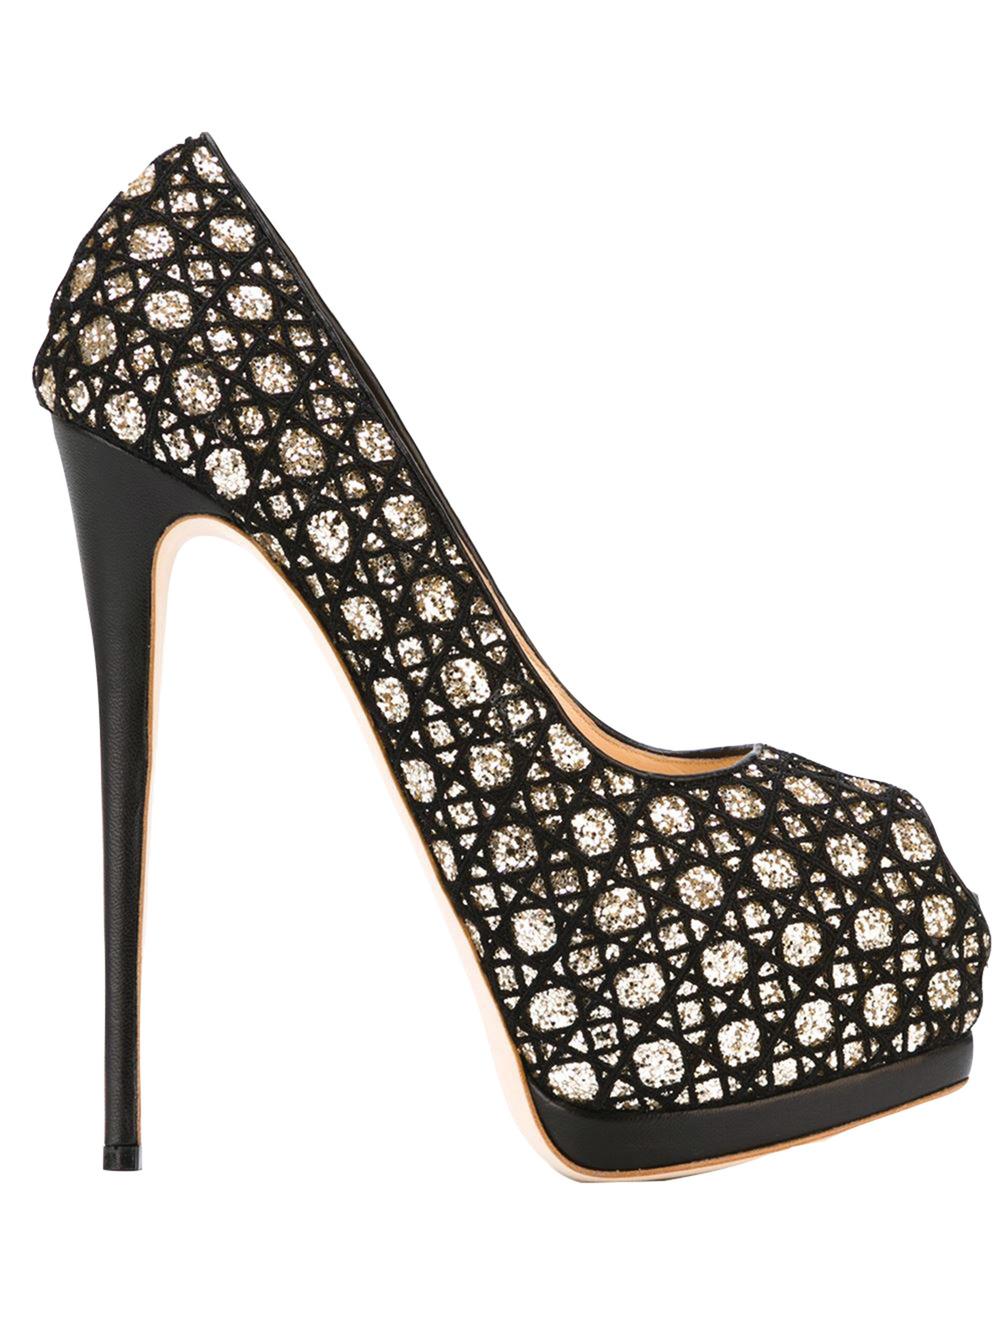 Giuseppe Zanotti Design Glitter Peep-Toe Pumps $1,108